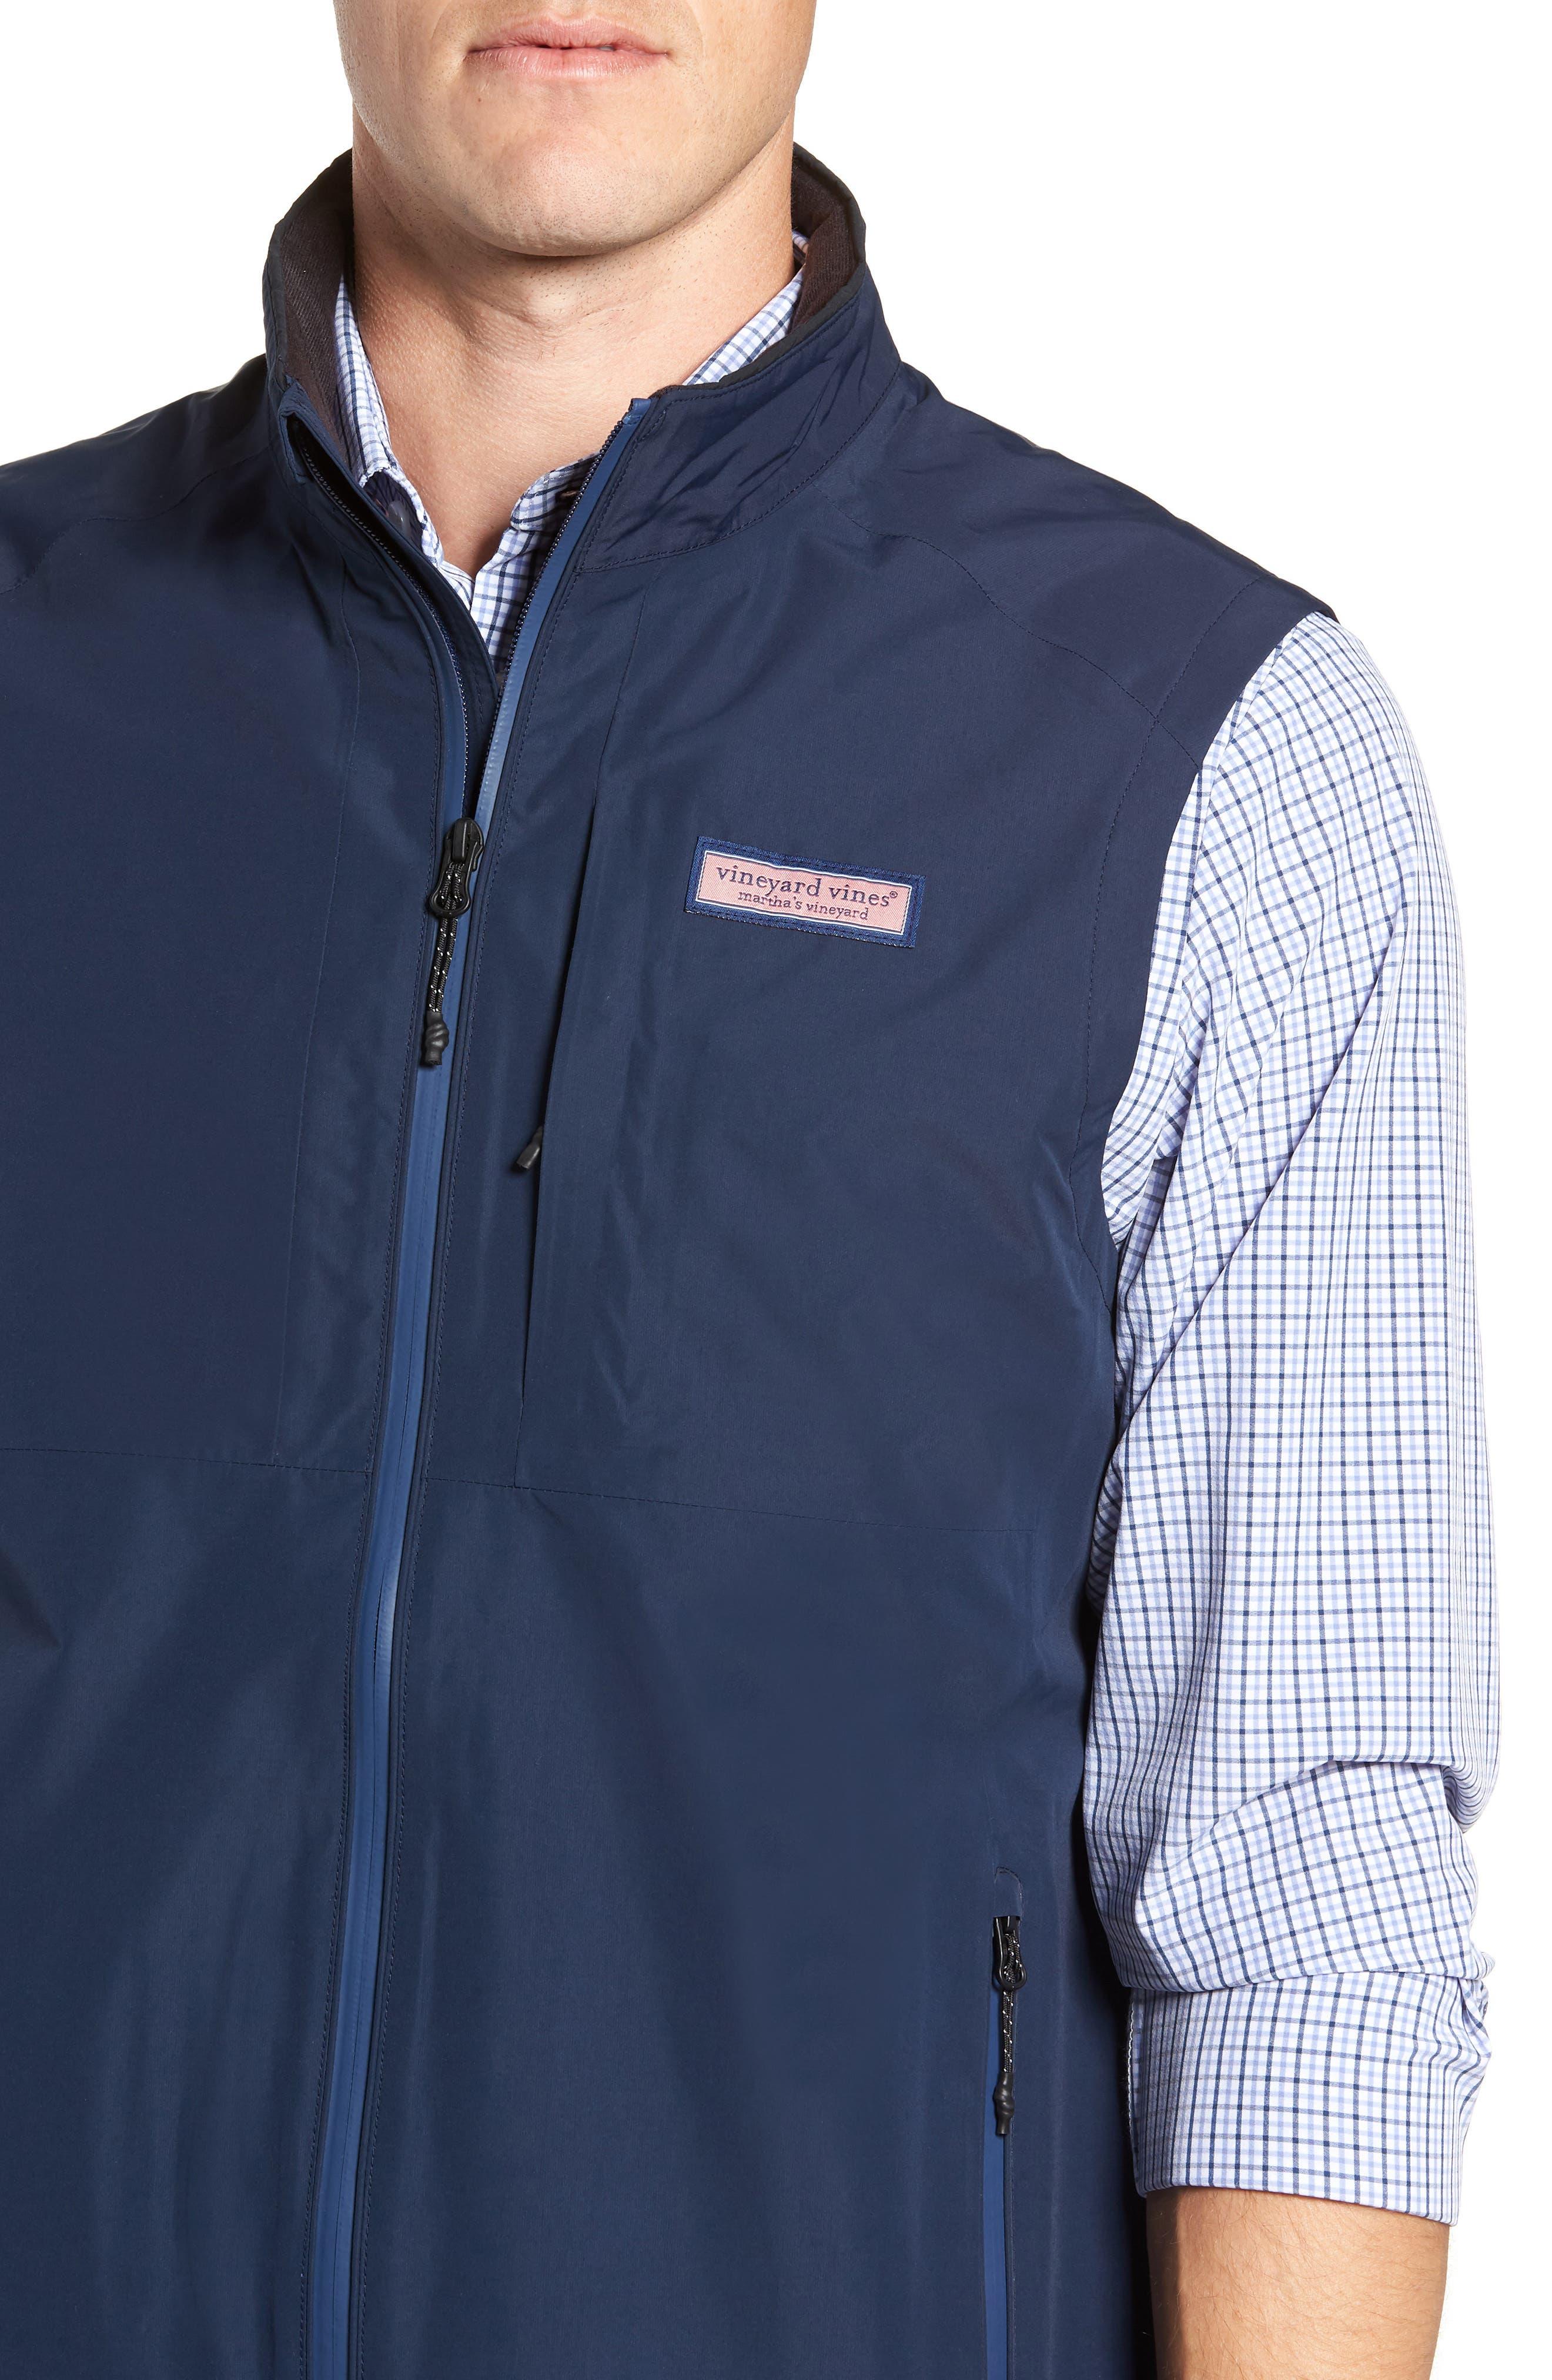 Tech Windbreaker Vest,                             Alternate thumbnail 4, color,                             410